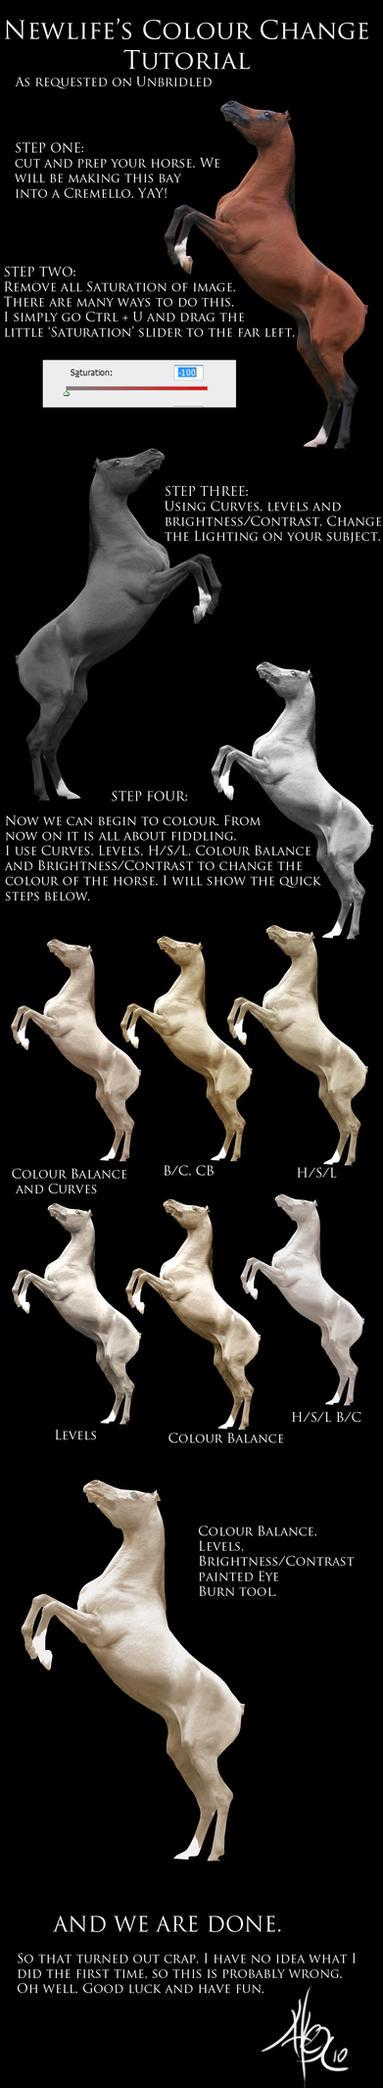 Colour Change Tut by equinelove